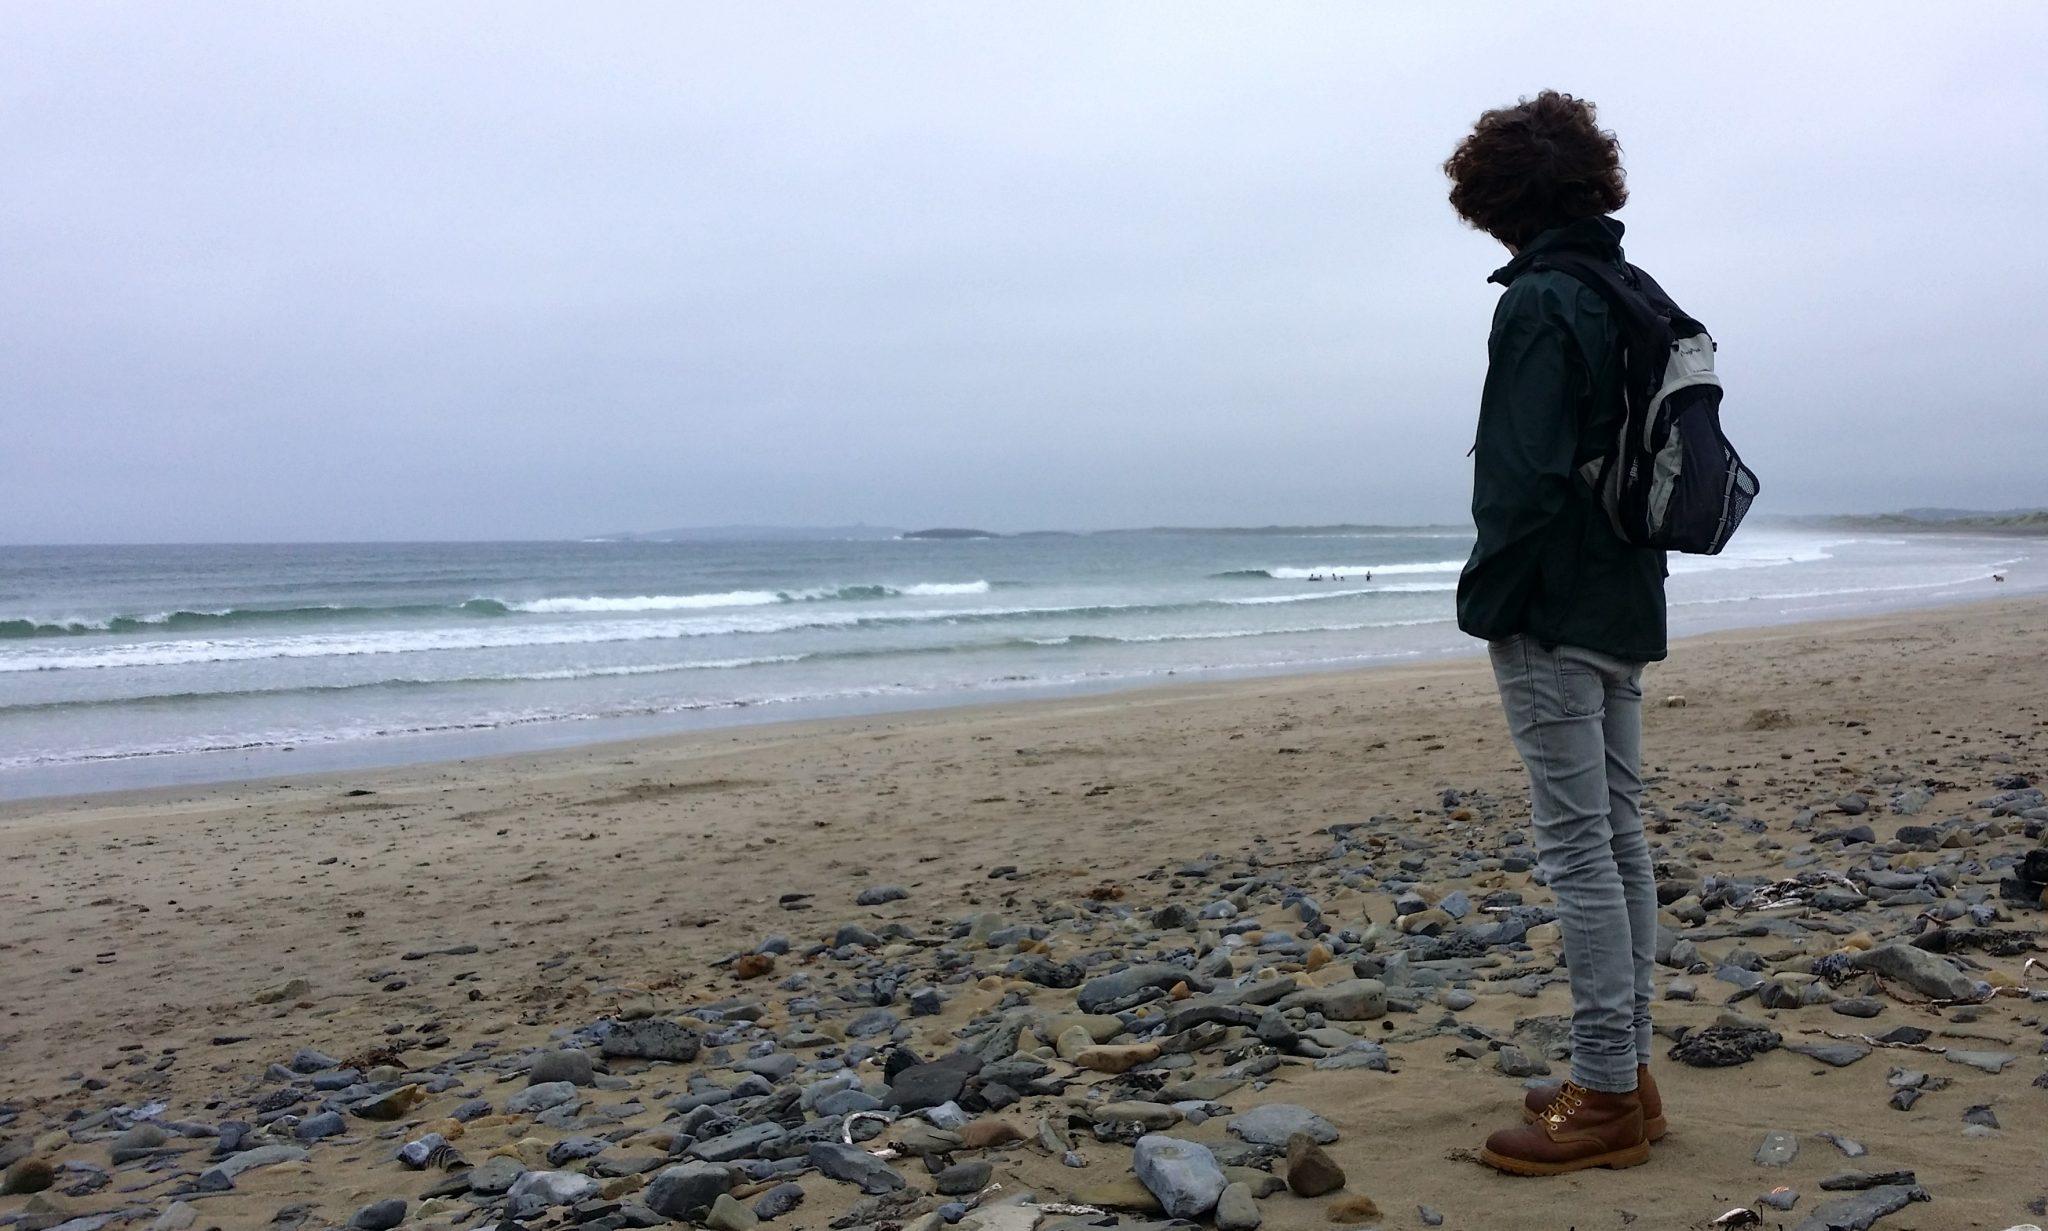 Playa de Srteedagh